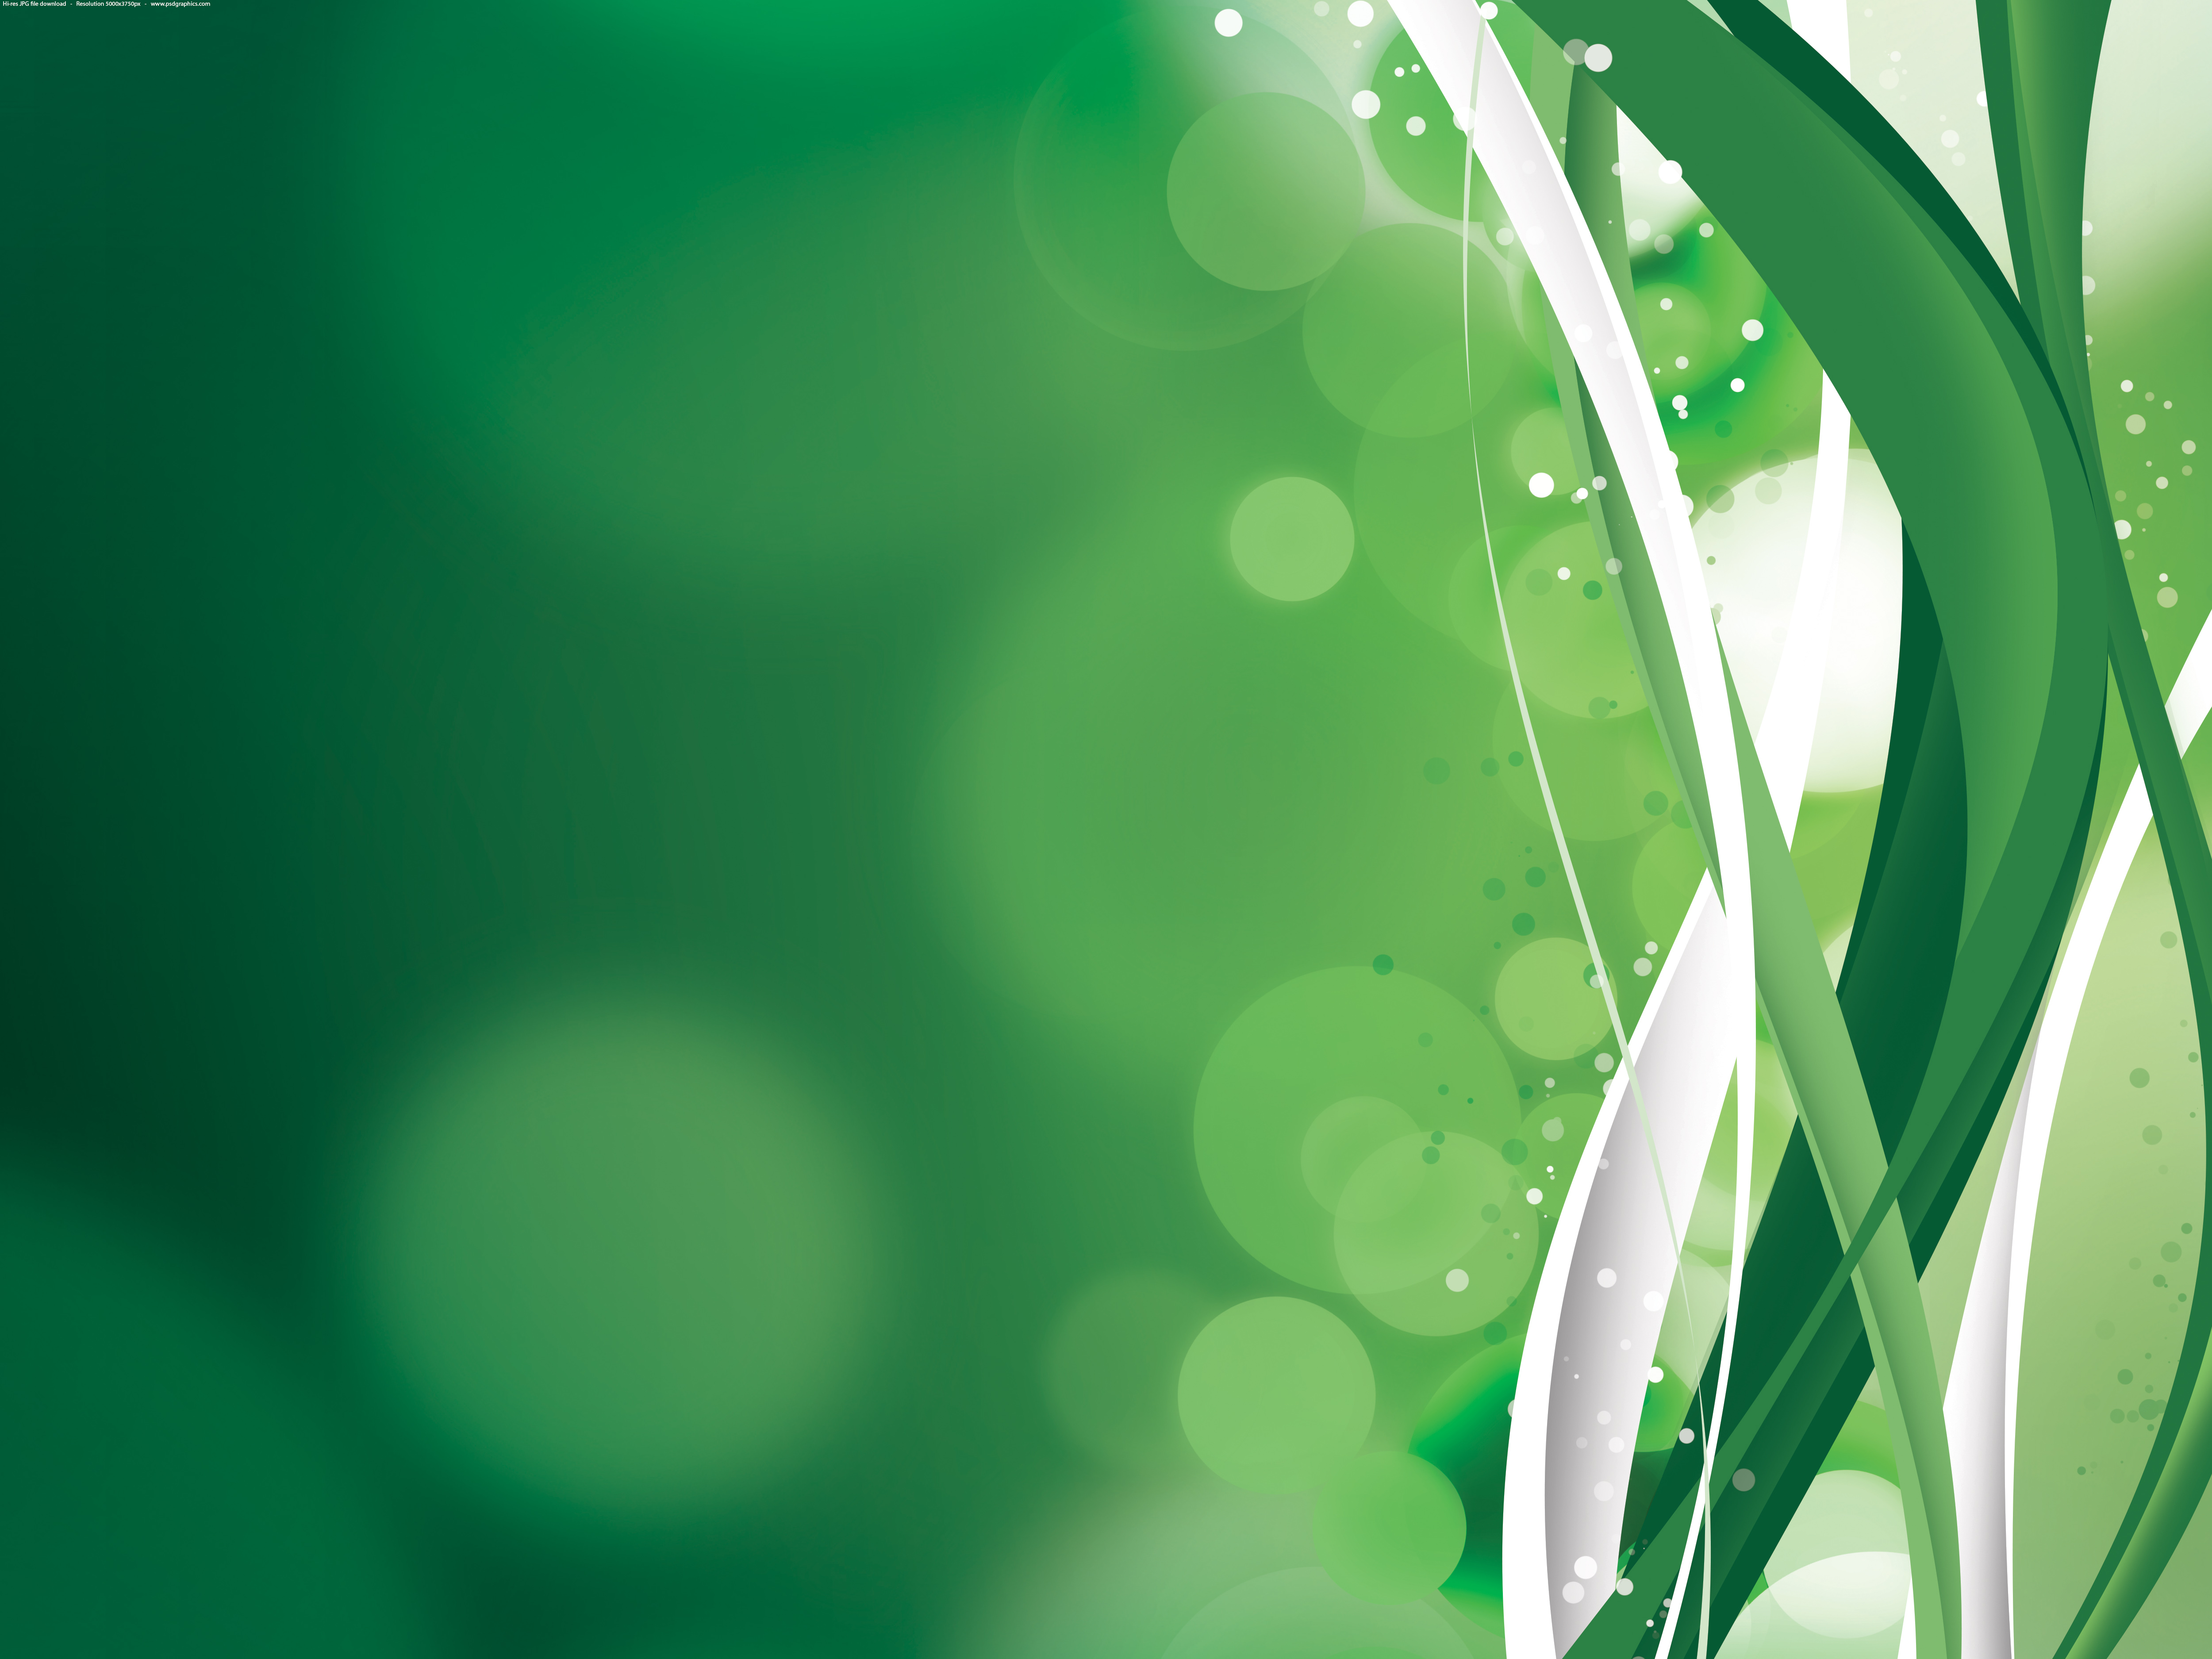 eye friendly wallpaper,green,water,grass,leaf,grass family